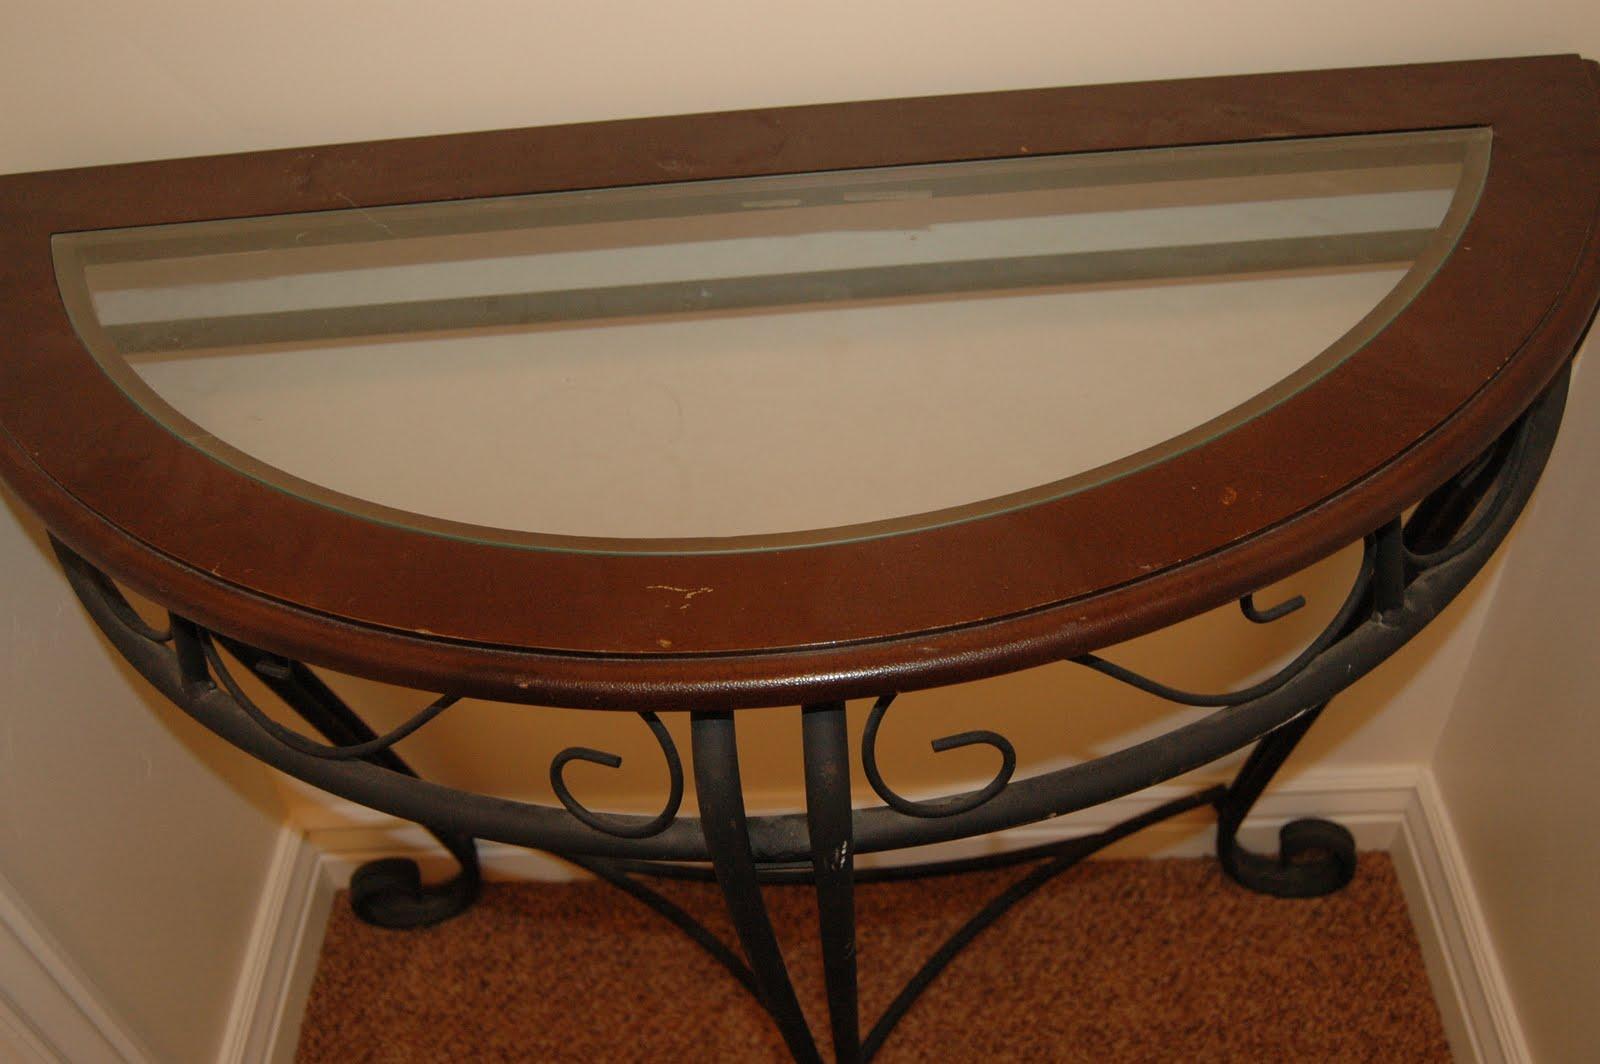 my good stuff 4 sale blog half circle end table sold. Black Bedroom Furniture Sets. Home Design Ideas